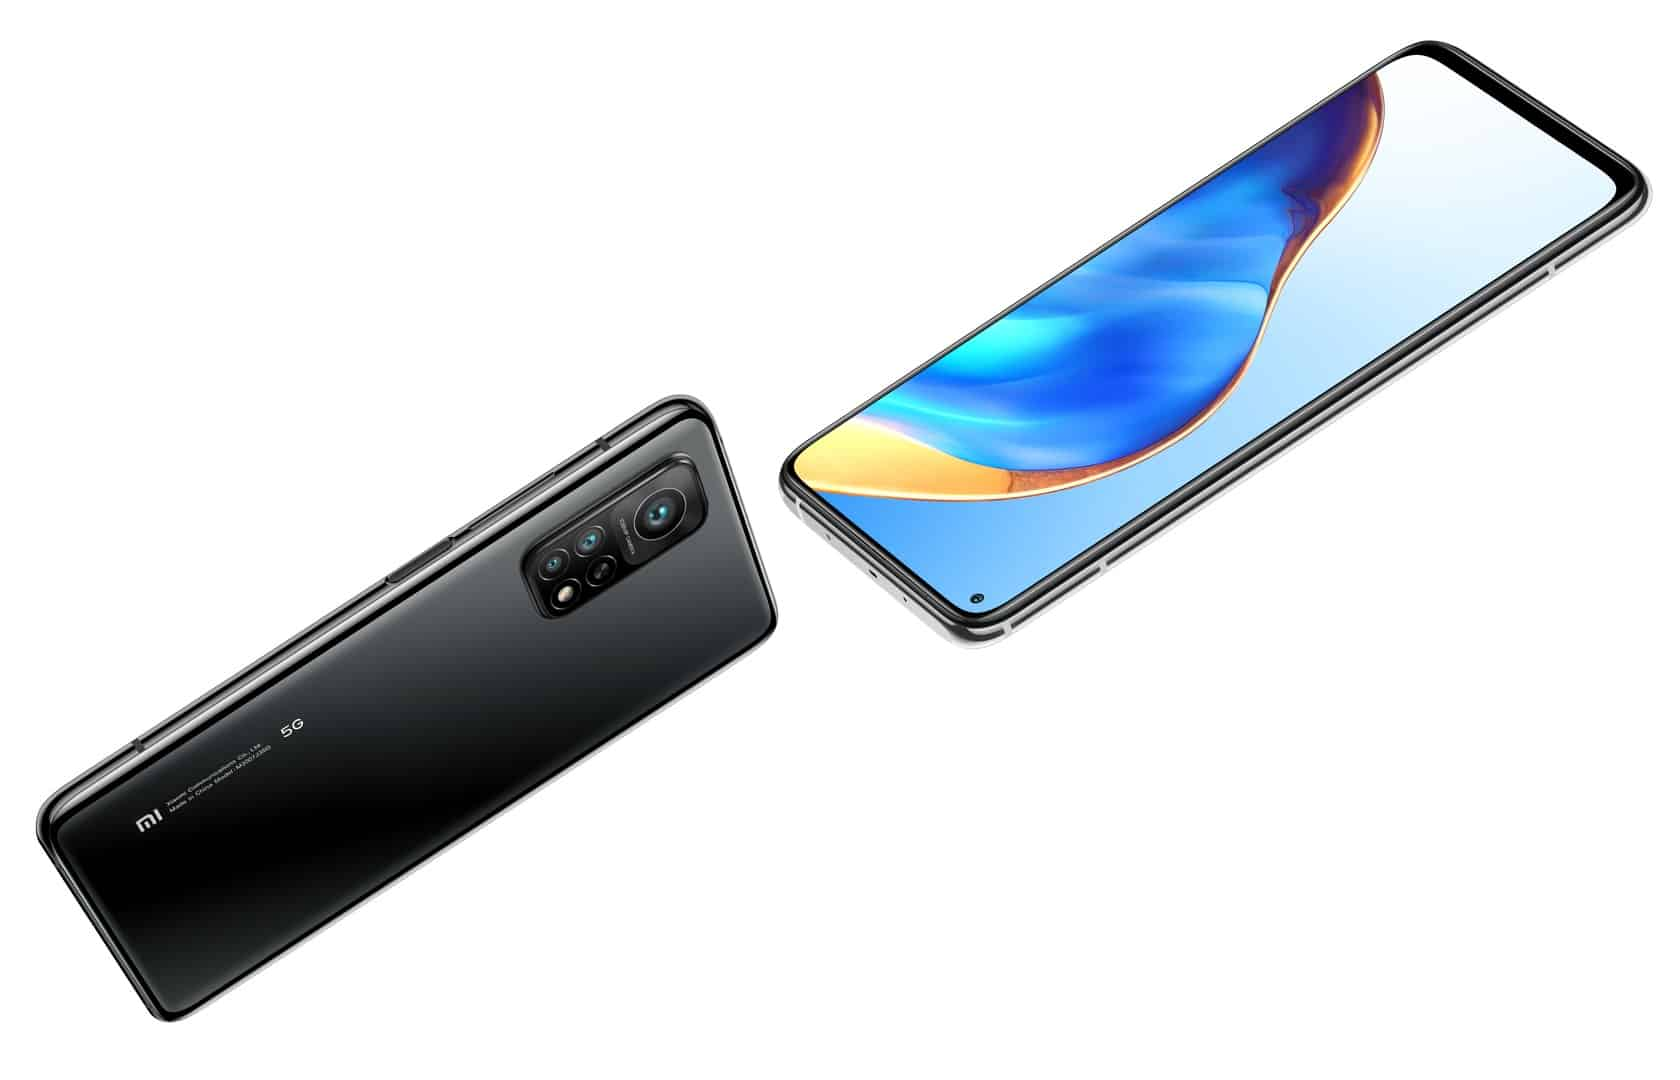 Xiaomi Mi 10T Pro image 10